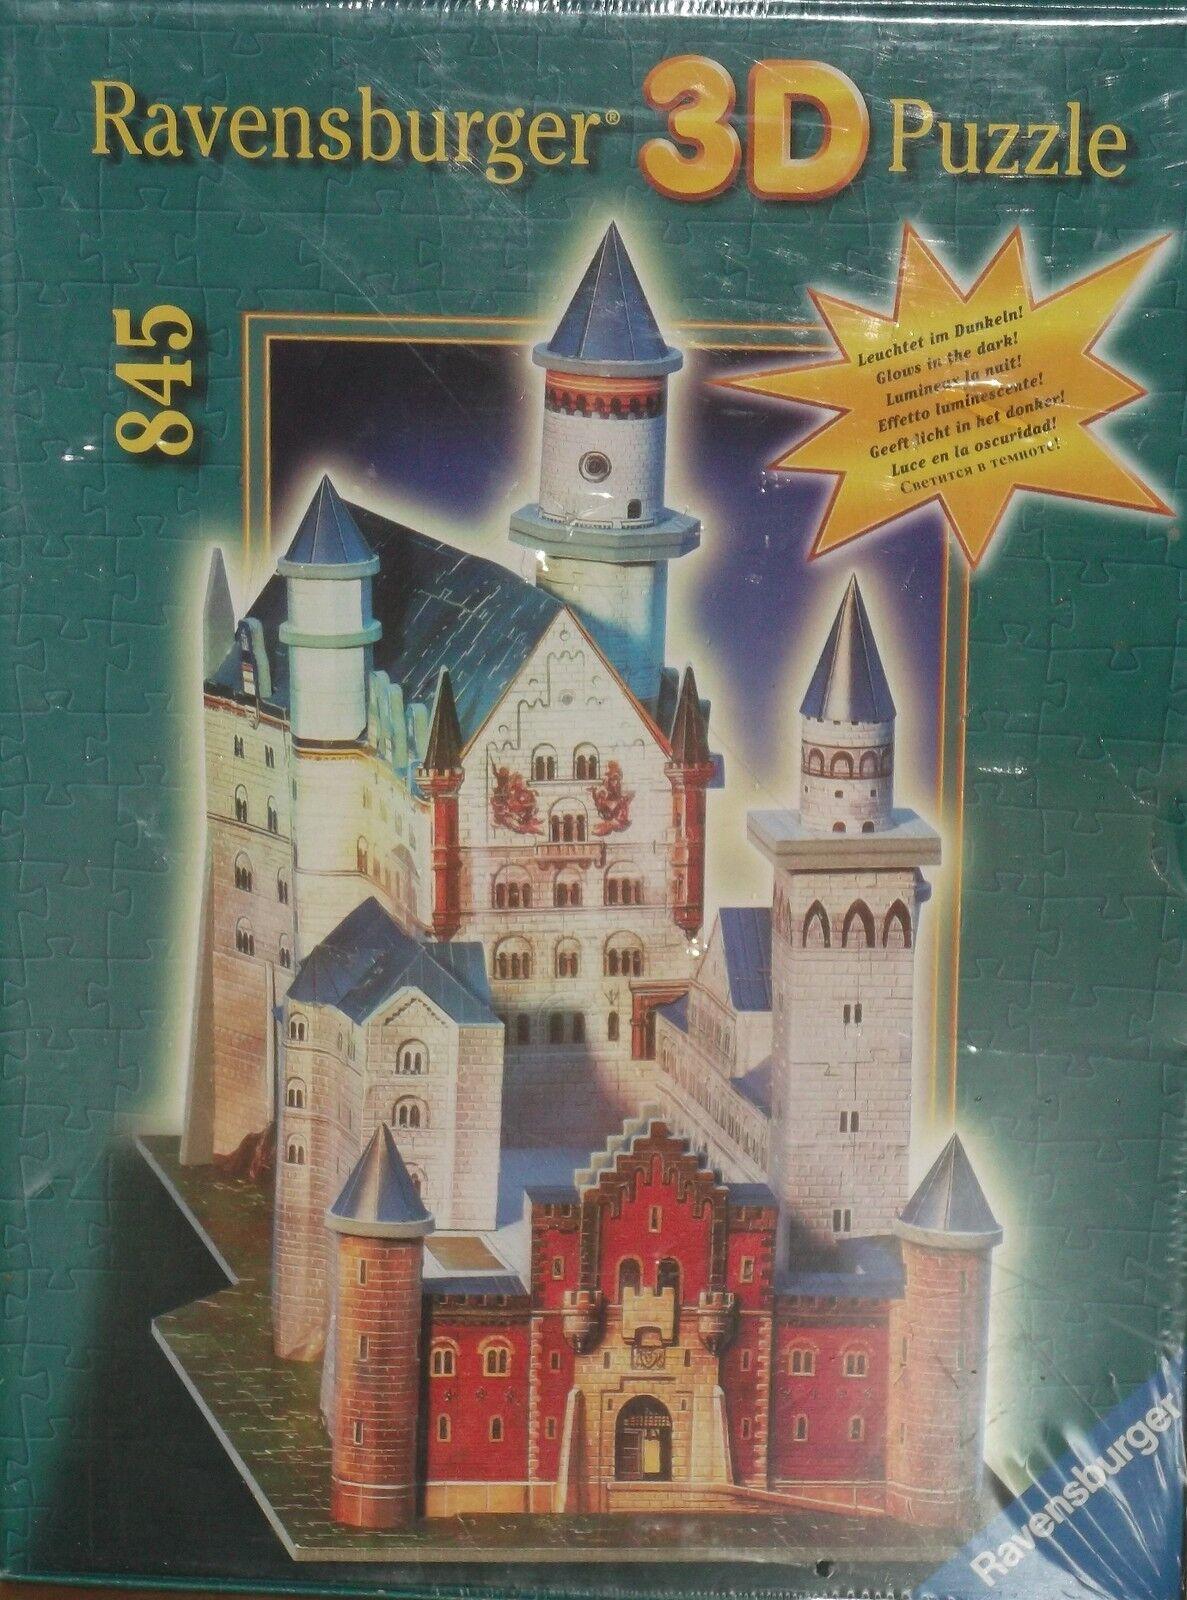 Neuschwans Tein 3d Puzzle-RAVENSBURGER - 845 pezzi-Glow in the Dark OVP